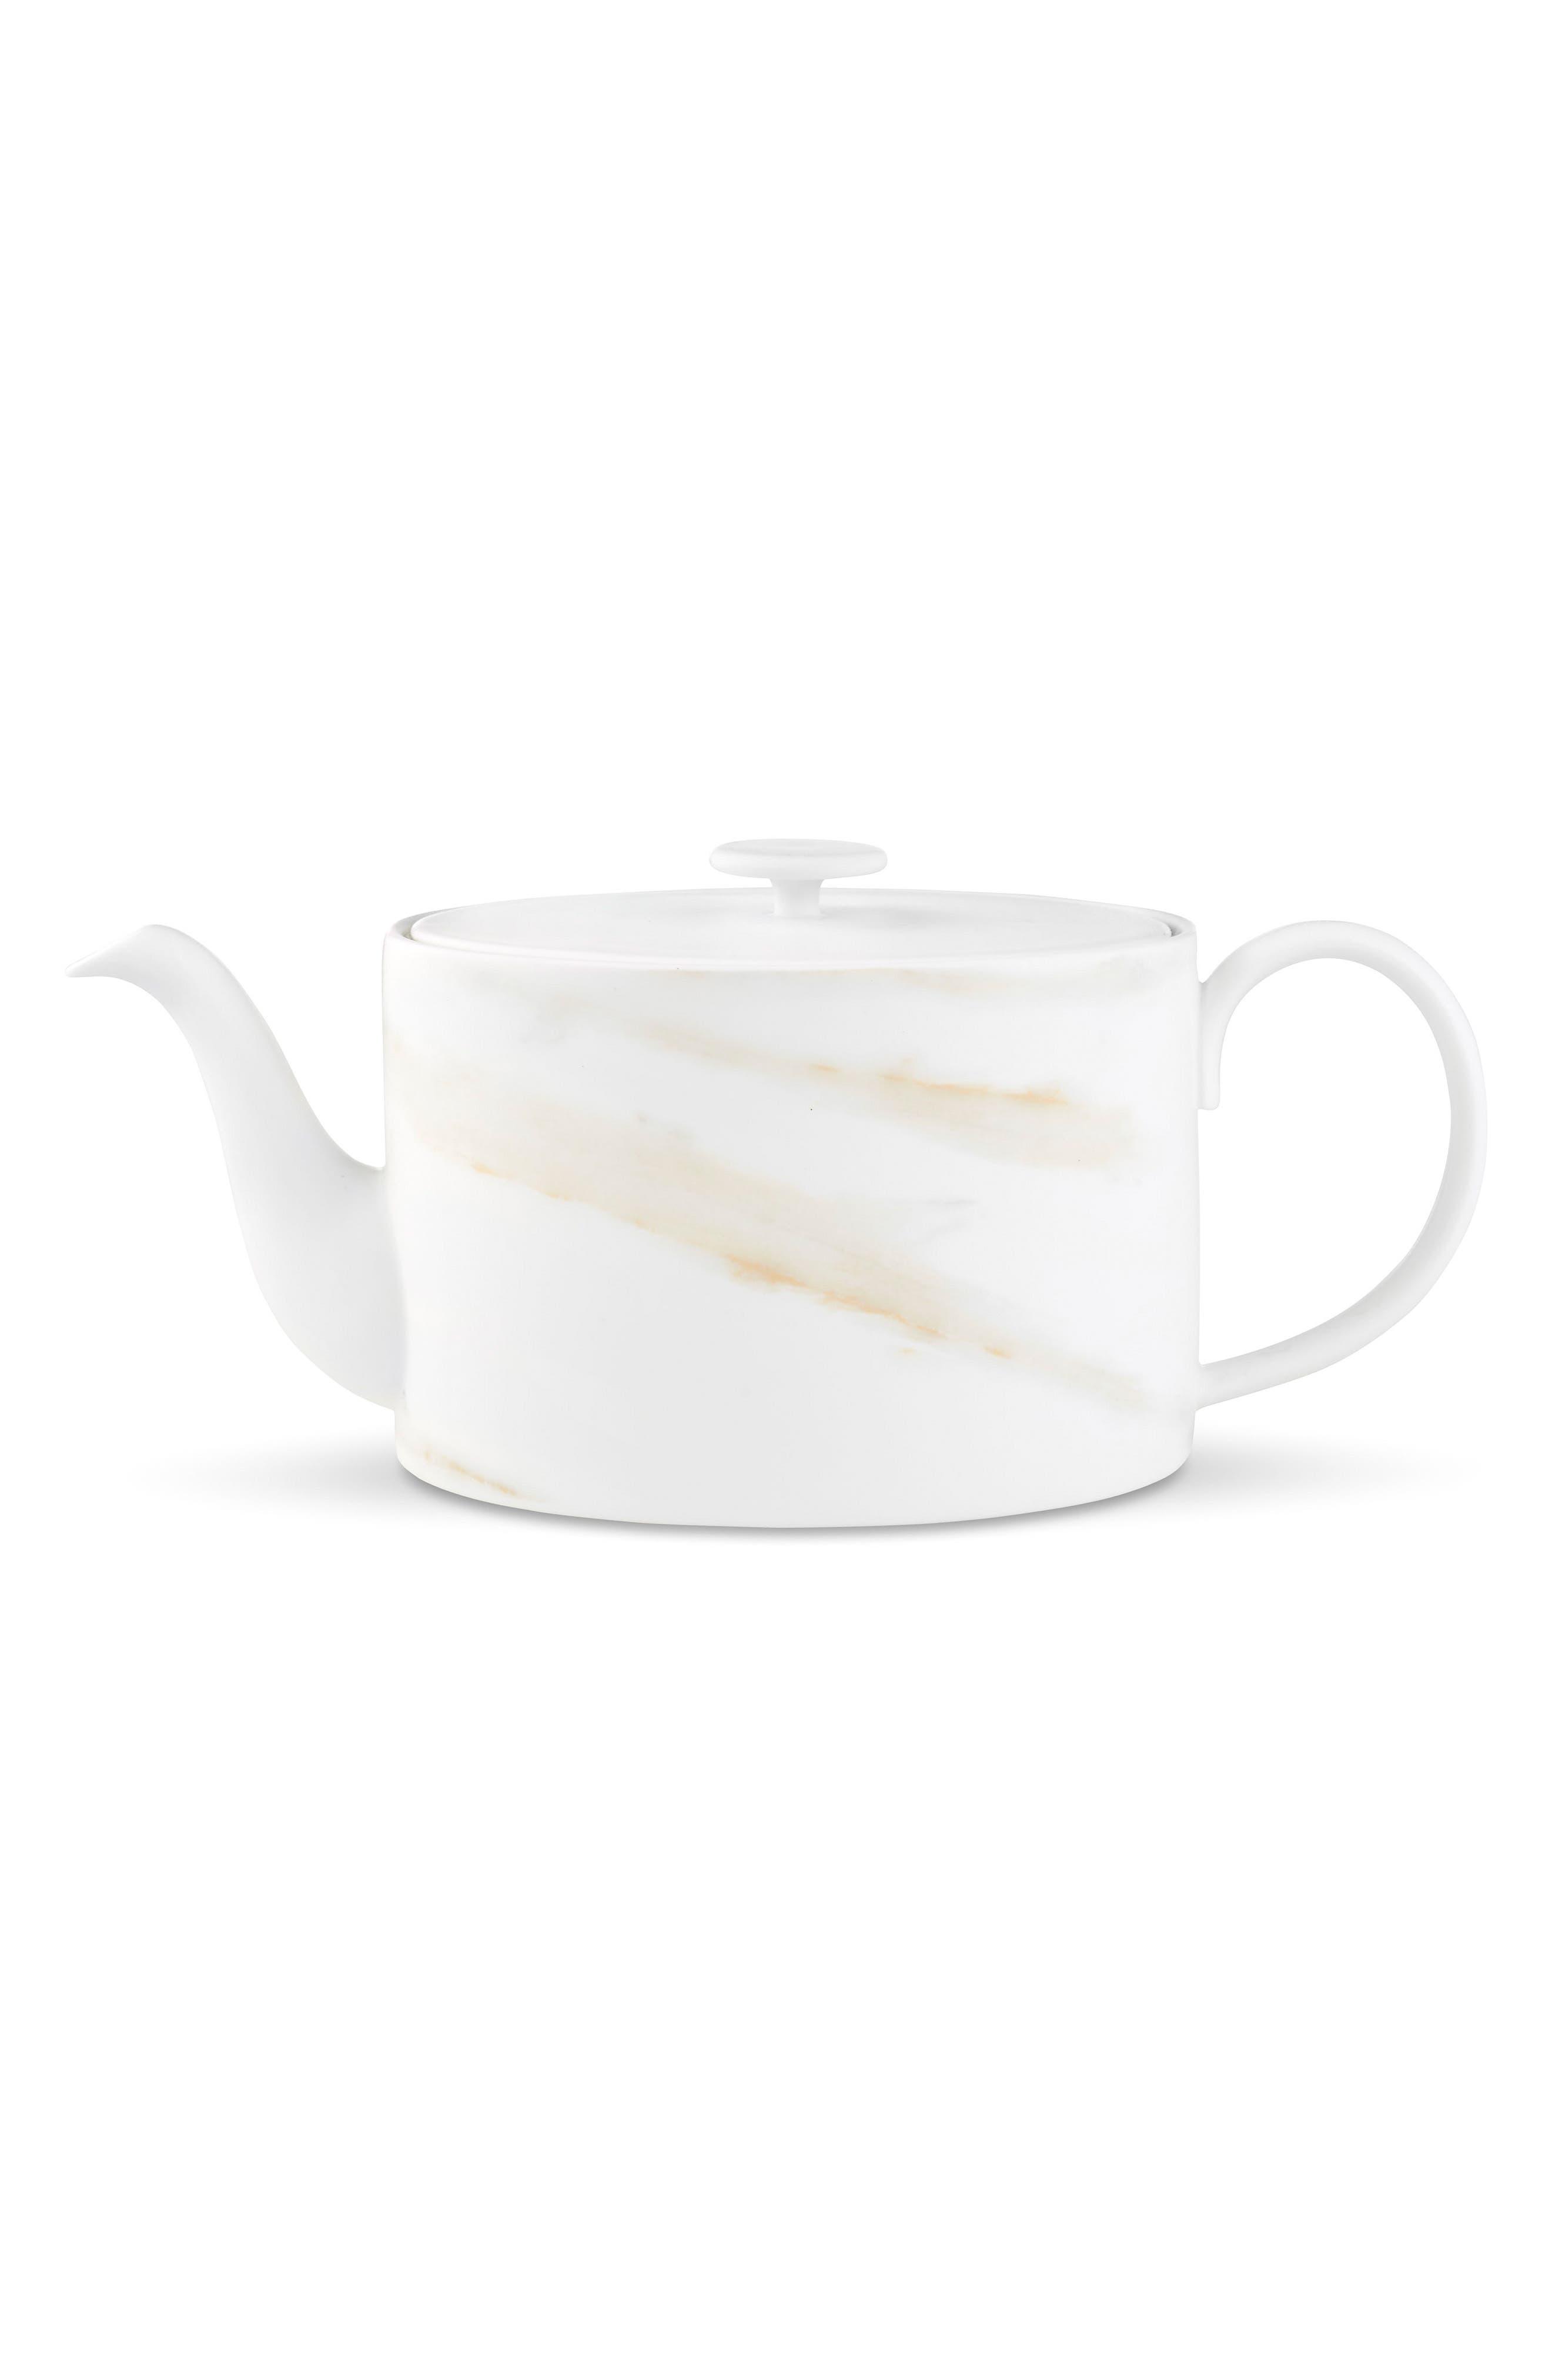 Vera Wang x Wedgwood Venato Imperial Teapot